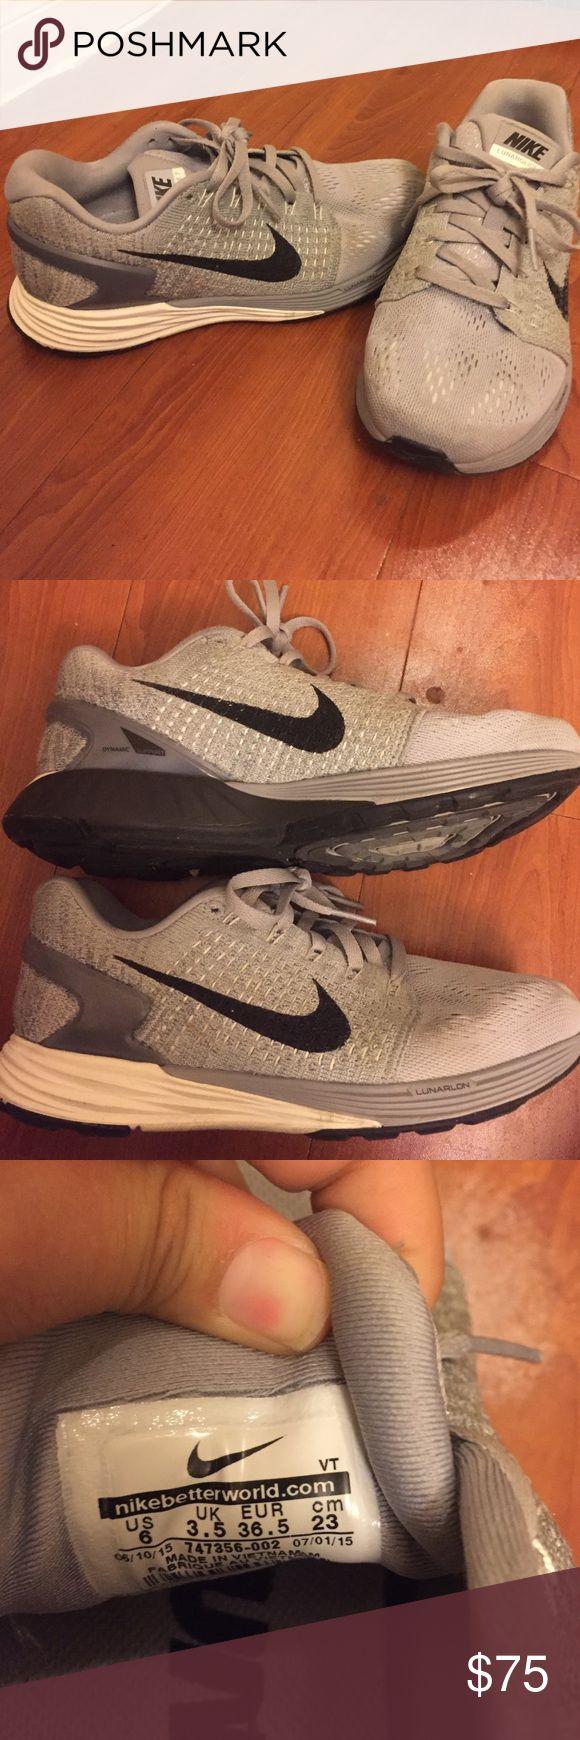 Grey Nike lunar glide 7s. Size 6 women's Grey Nike lunar glide 7s. Size 6 women's Nike Shoes Athletic Shoes